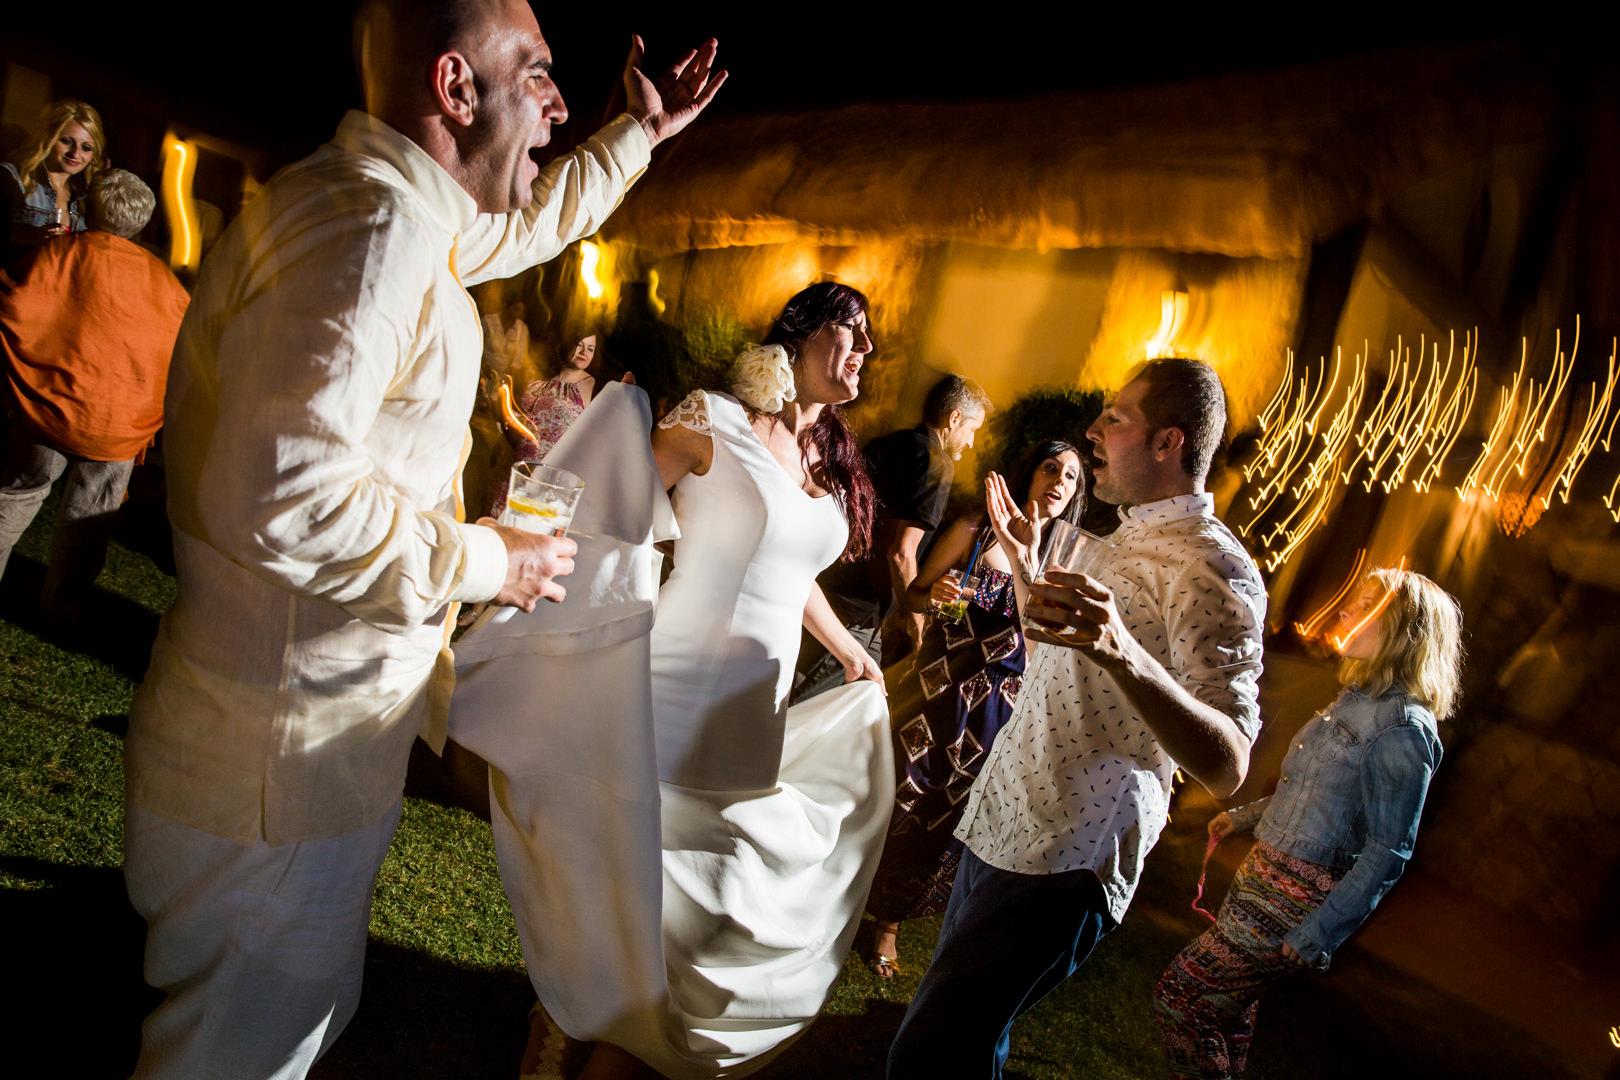 Boda-Sajorami-Beach-Cadiz-Zahora-Pedro-Gema-engagement-Rafael-Torres-fotografo-bodas-sevilla-madrid-barcelona-wedding-photographer--52.jpg